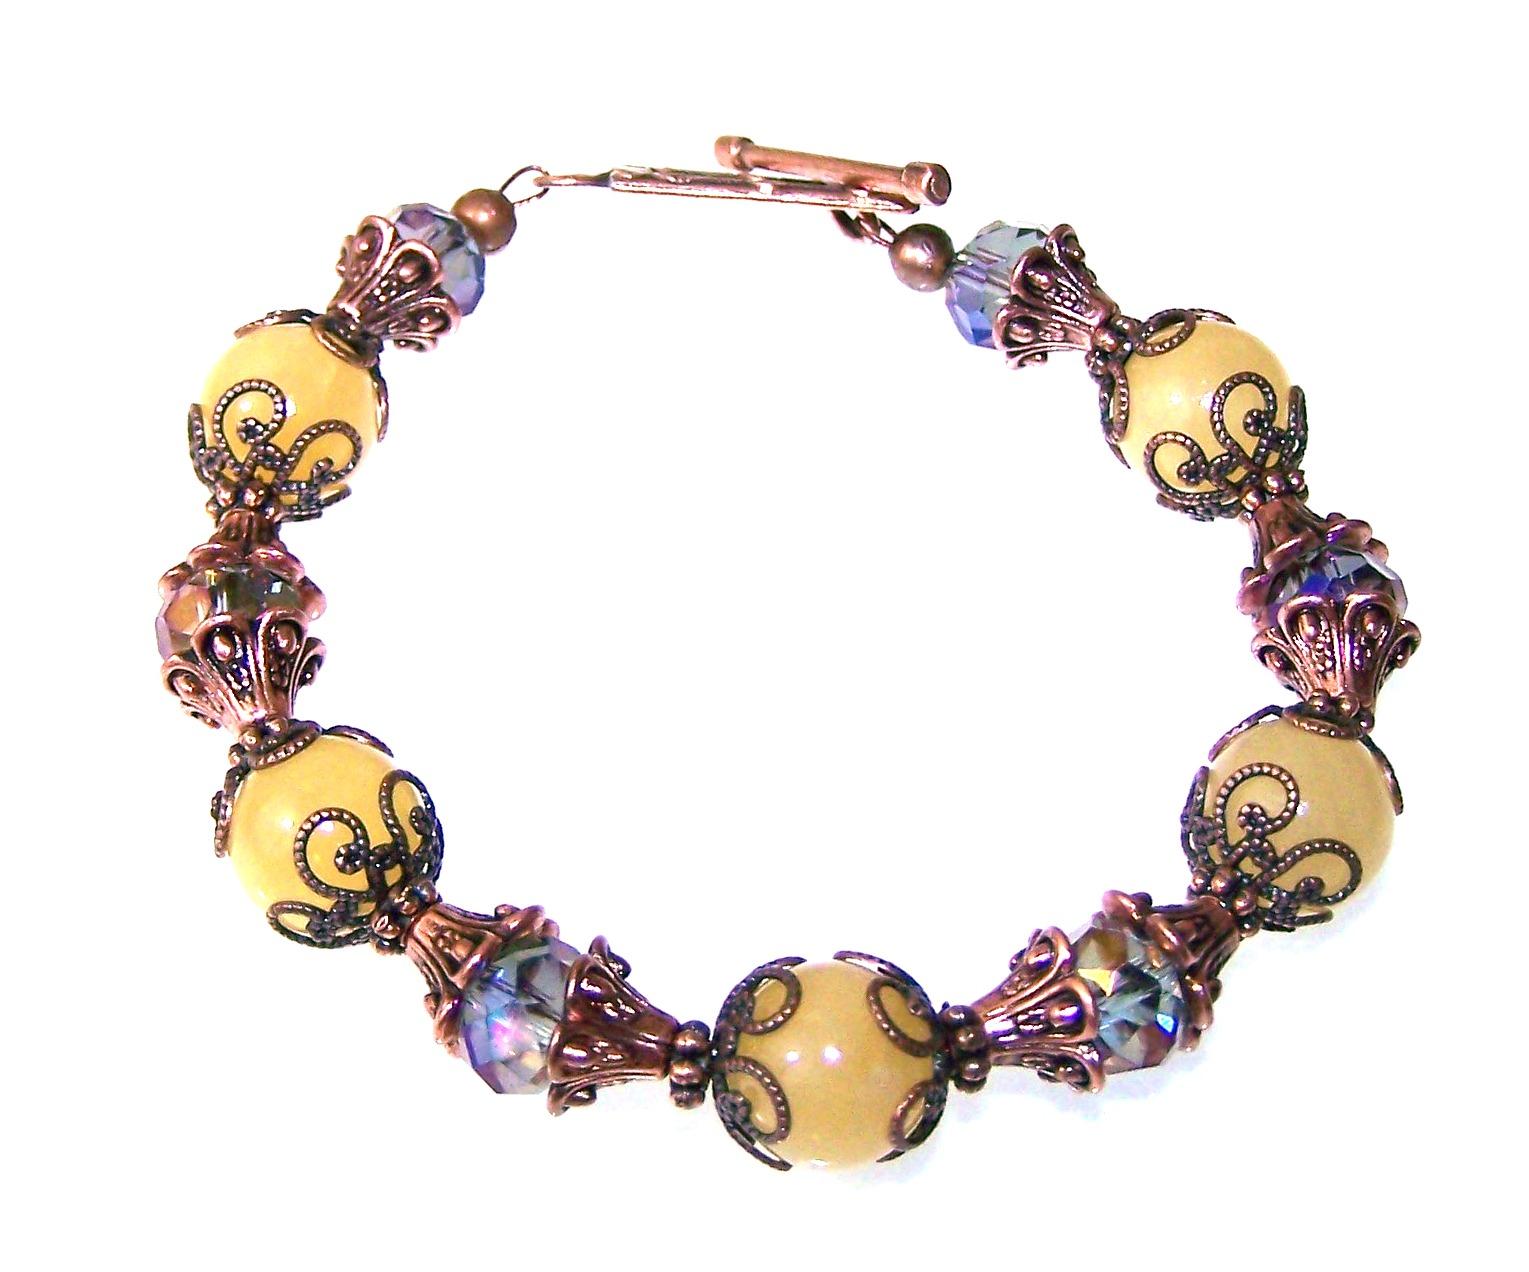 Harmony Bracelet Beaded Jewelry Making Kit